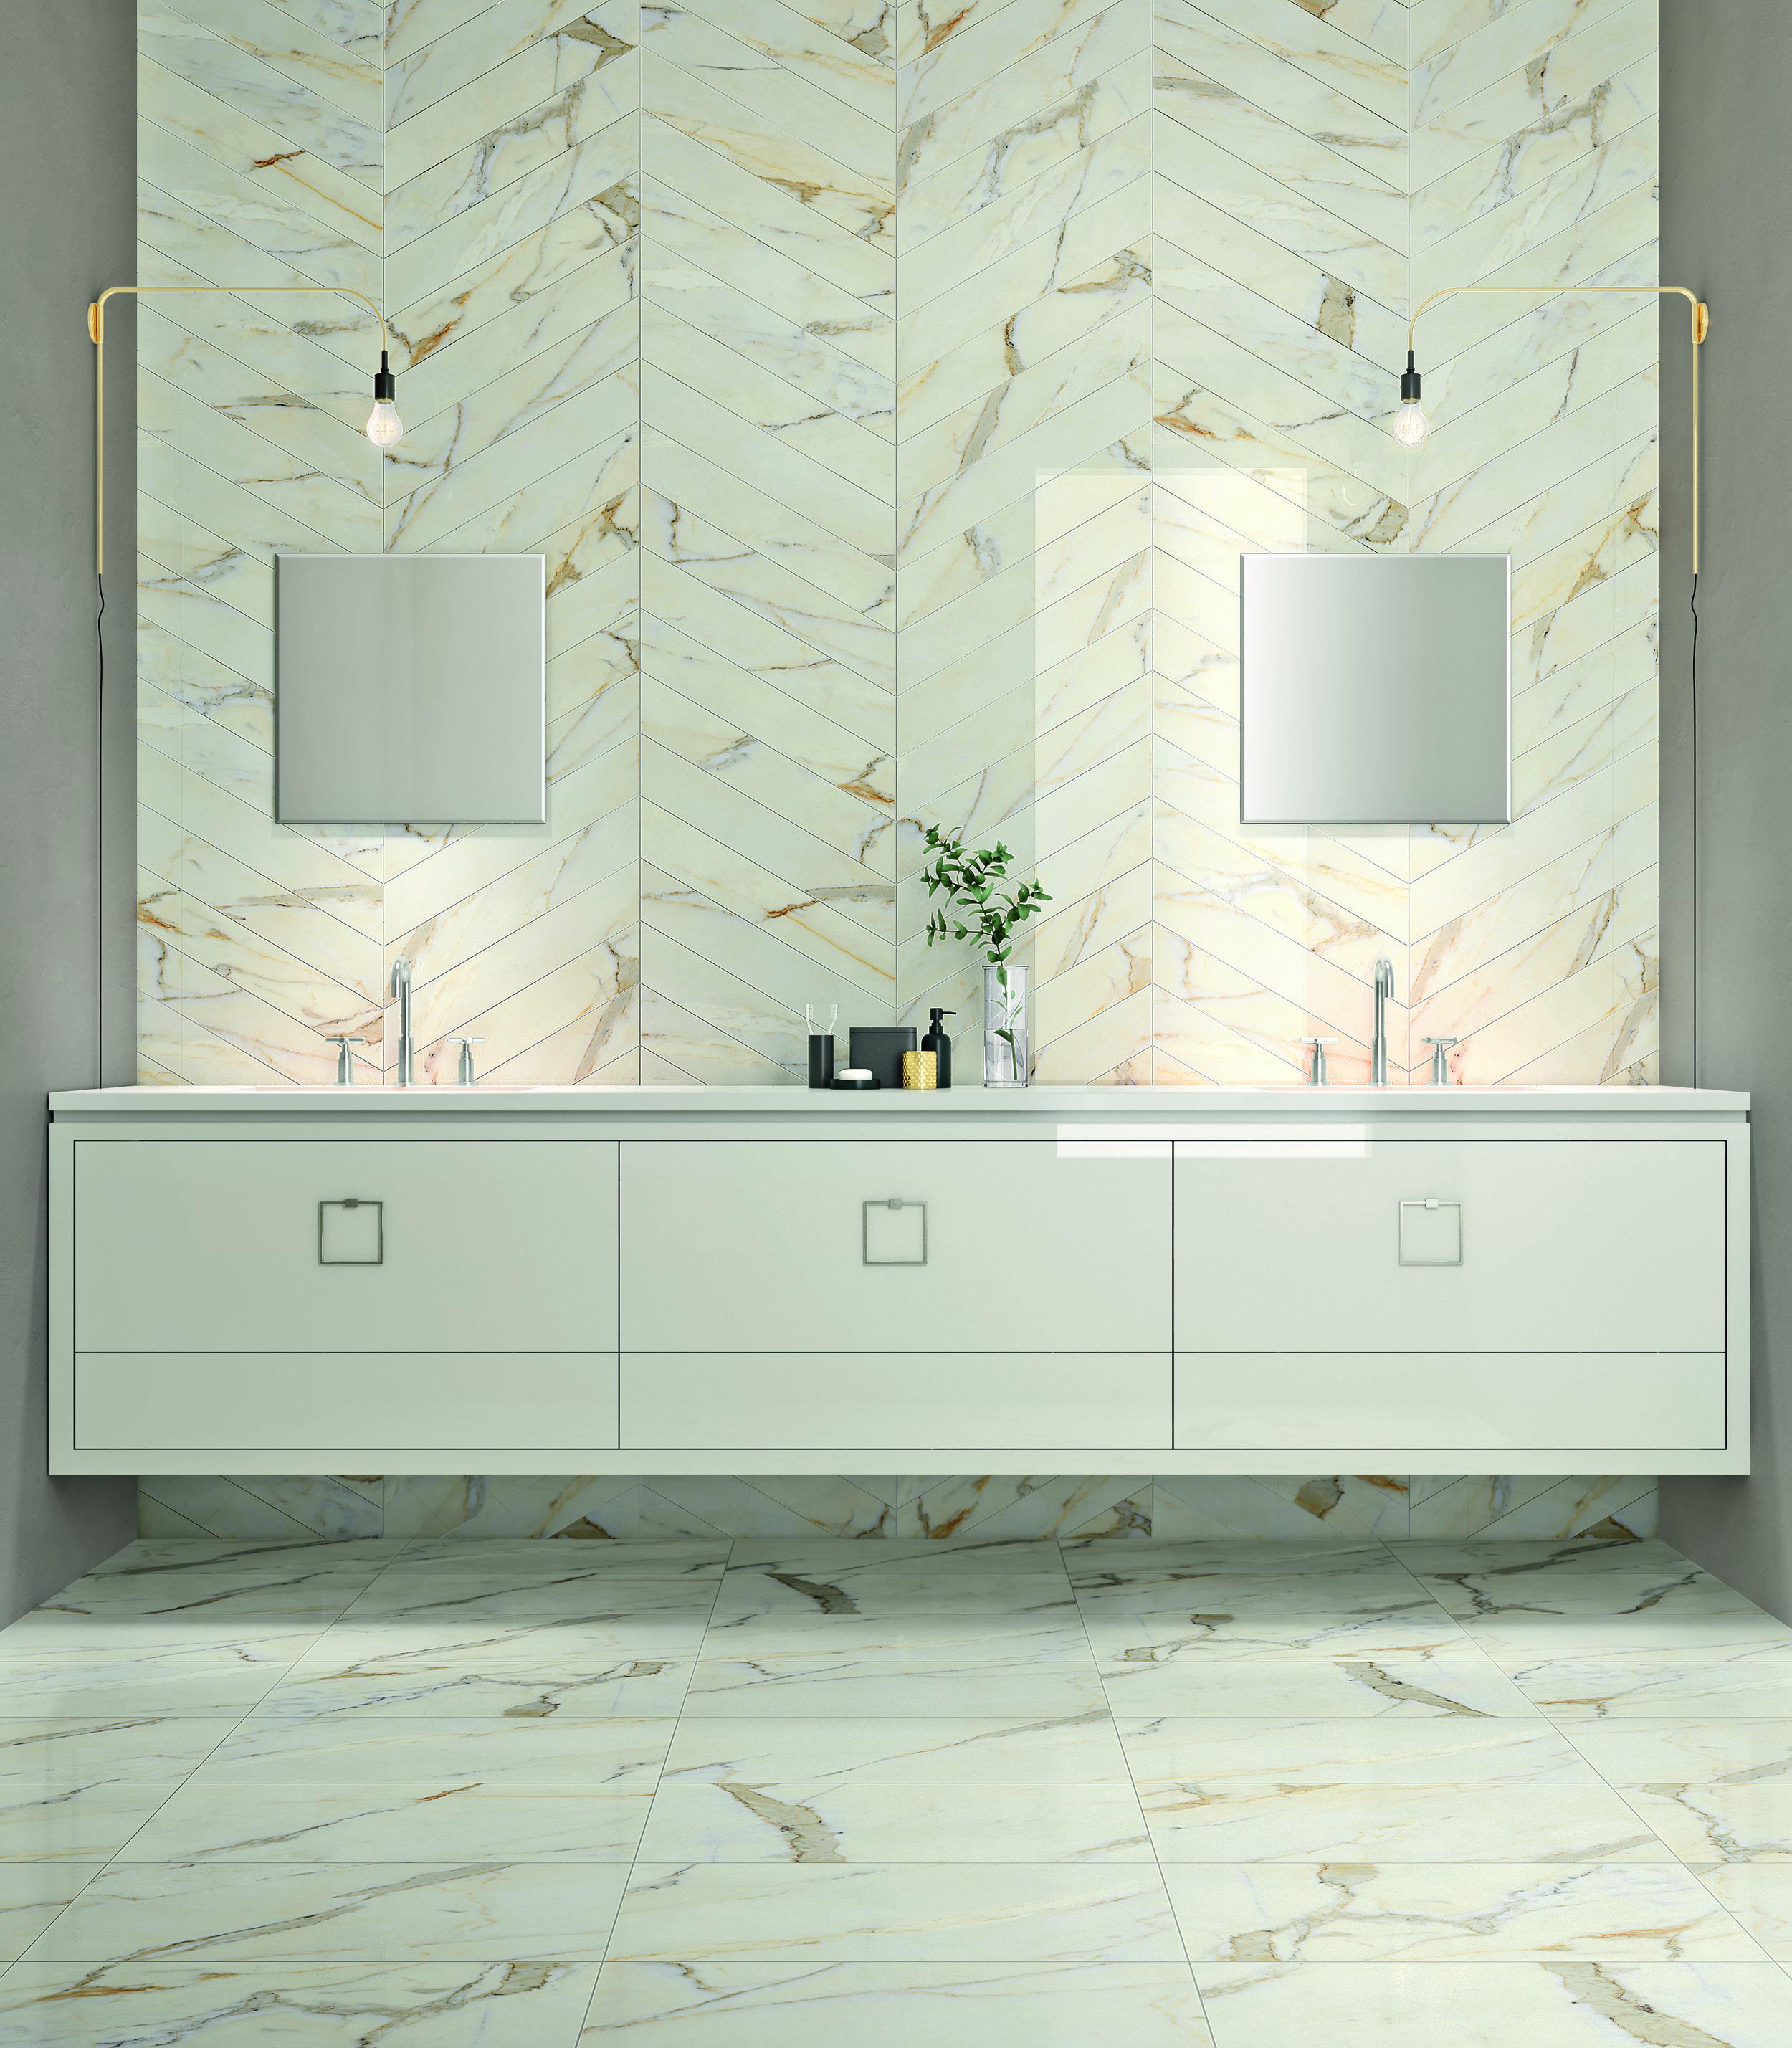 STP - Stonepeak - classic2.0 - callacata oro - poreclain Tile - Bathroom.jpg